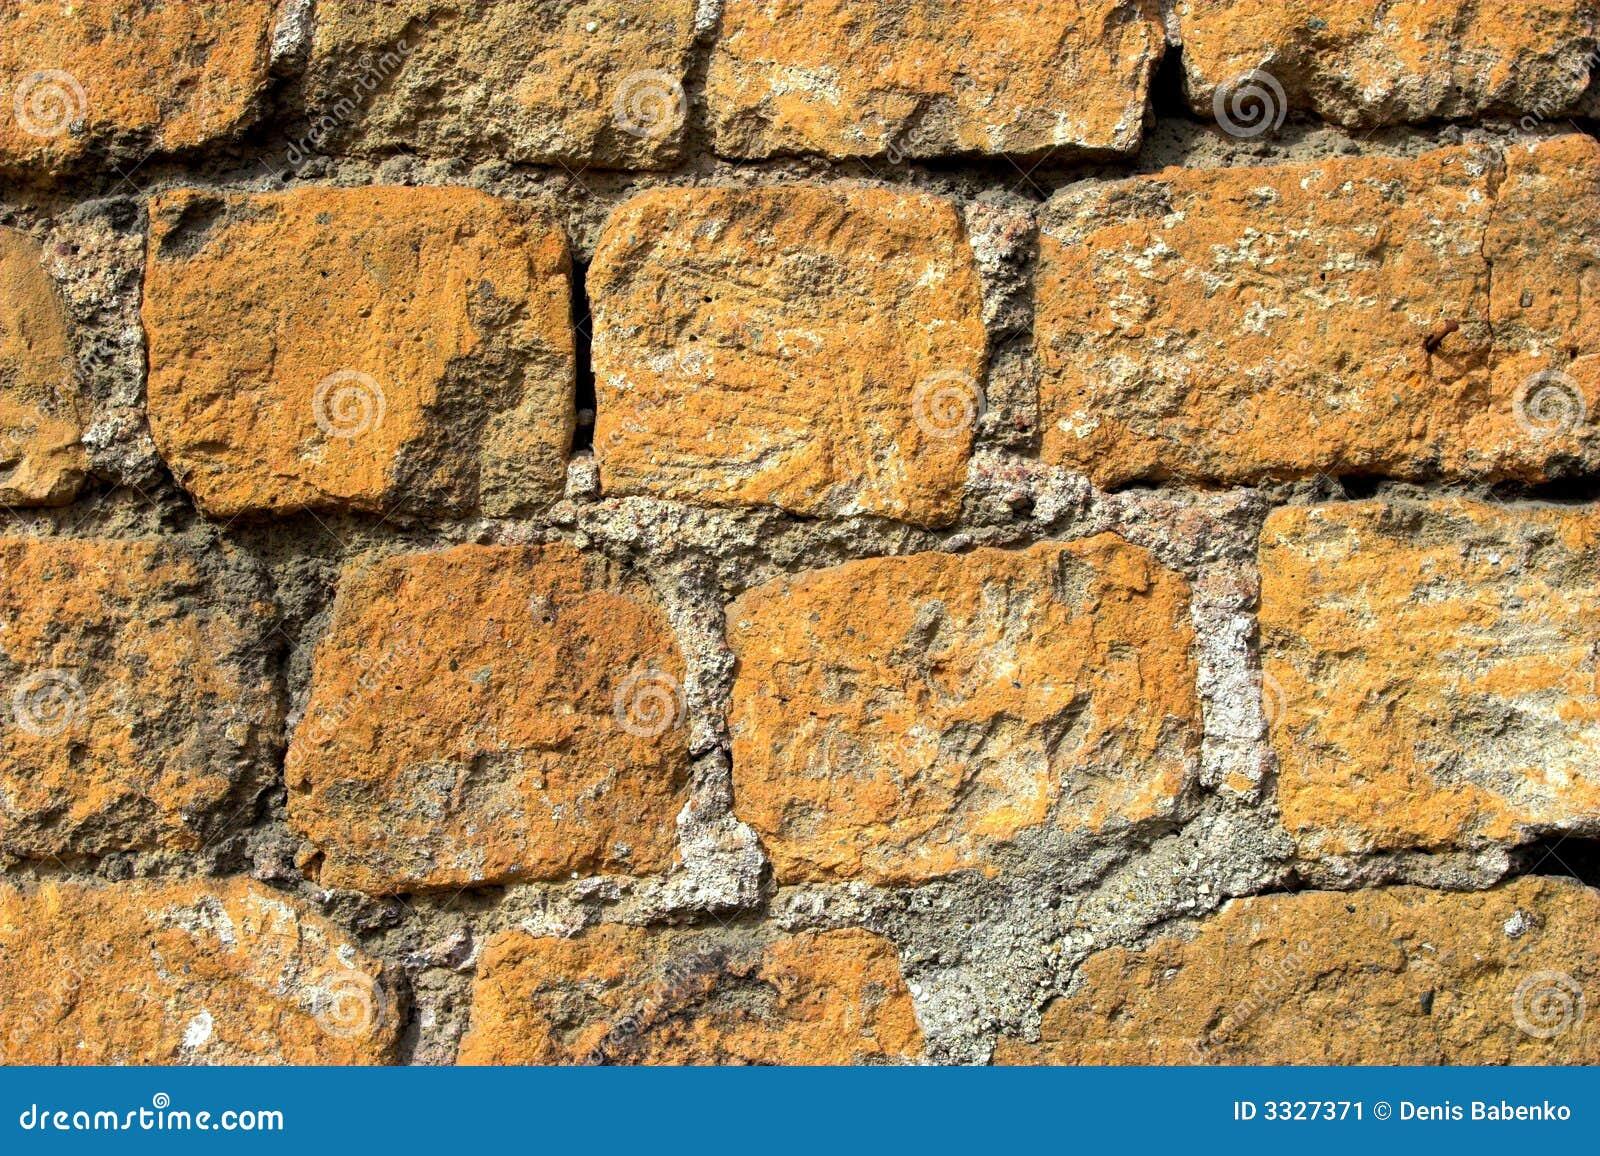 Old orange and grey brick wall